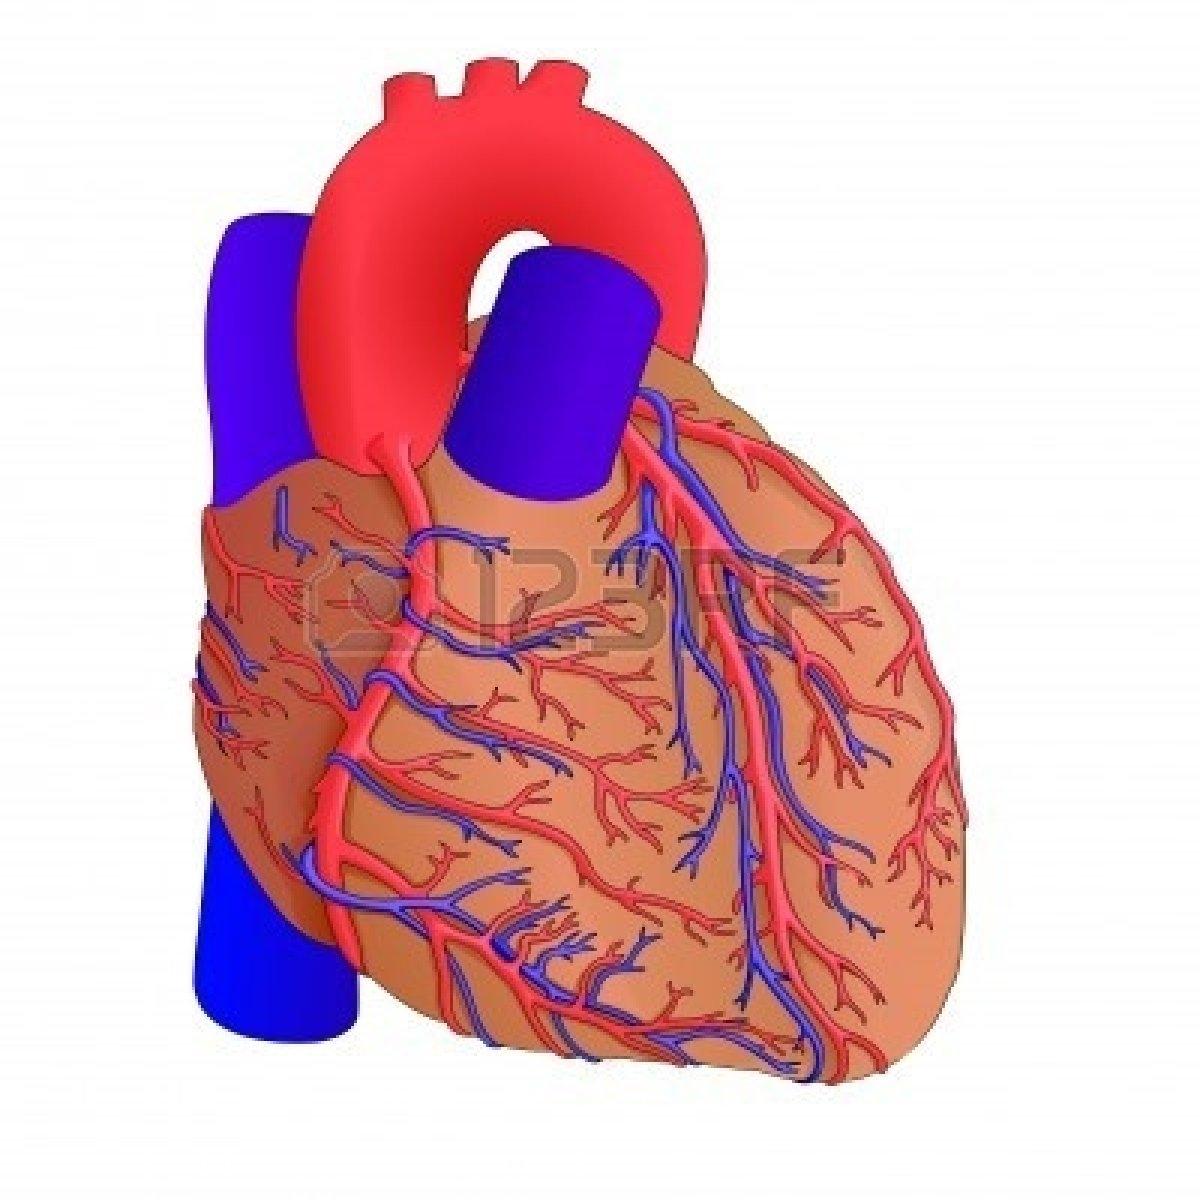 1200x1200 Anatomical Heart Clip Art